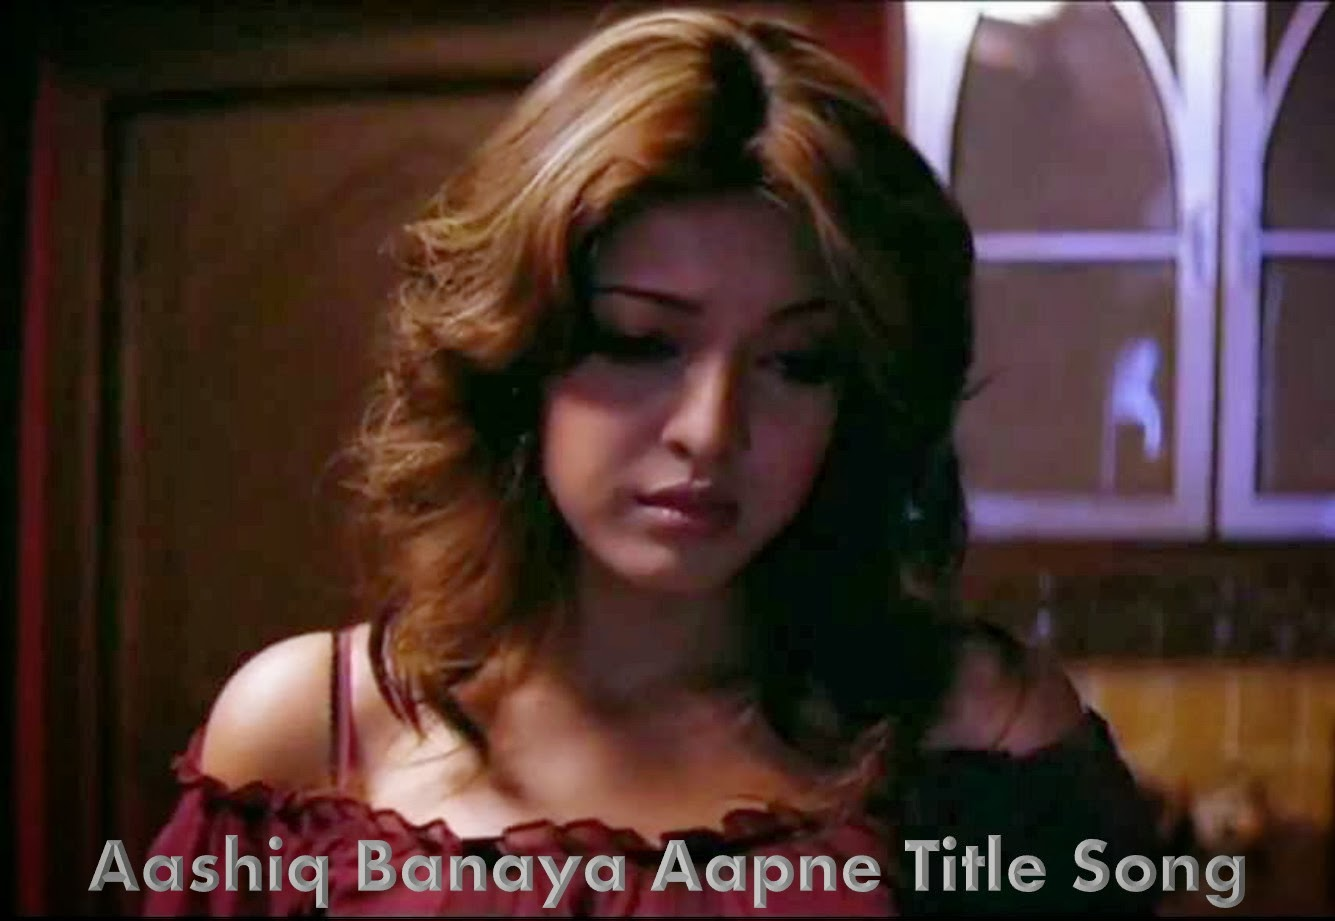 Listen Aashiq Banaya Mp3 download - mp3bears.life